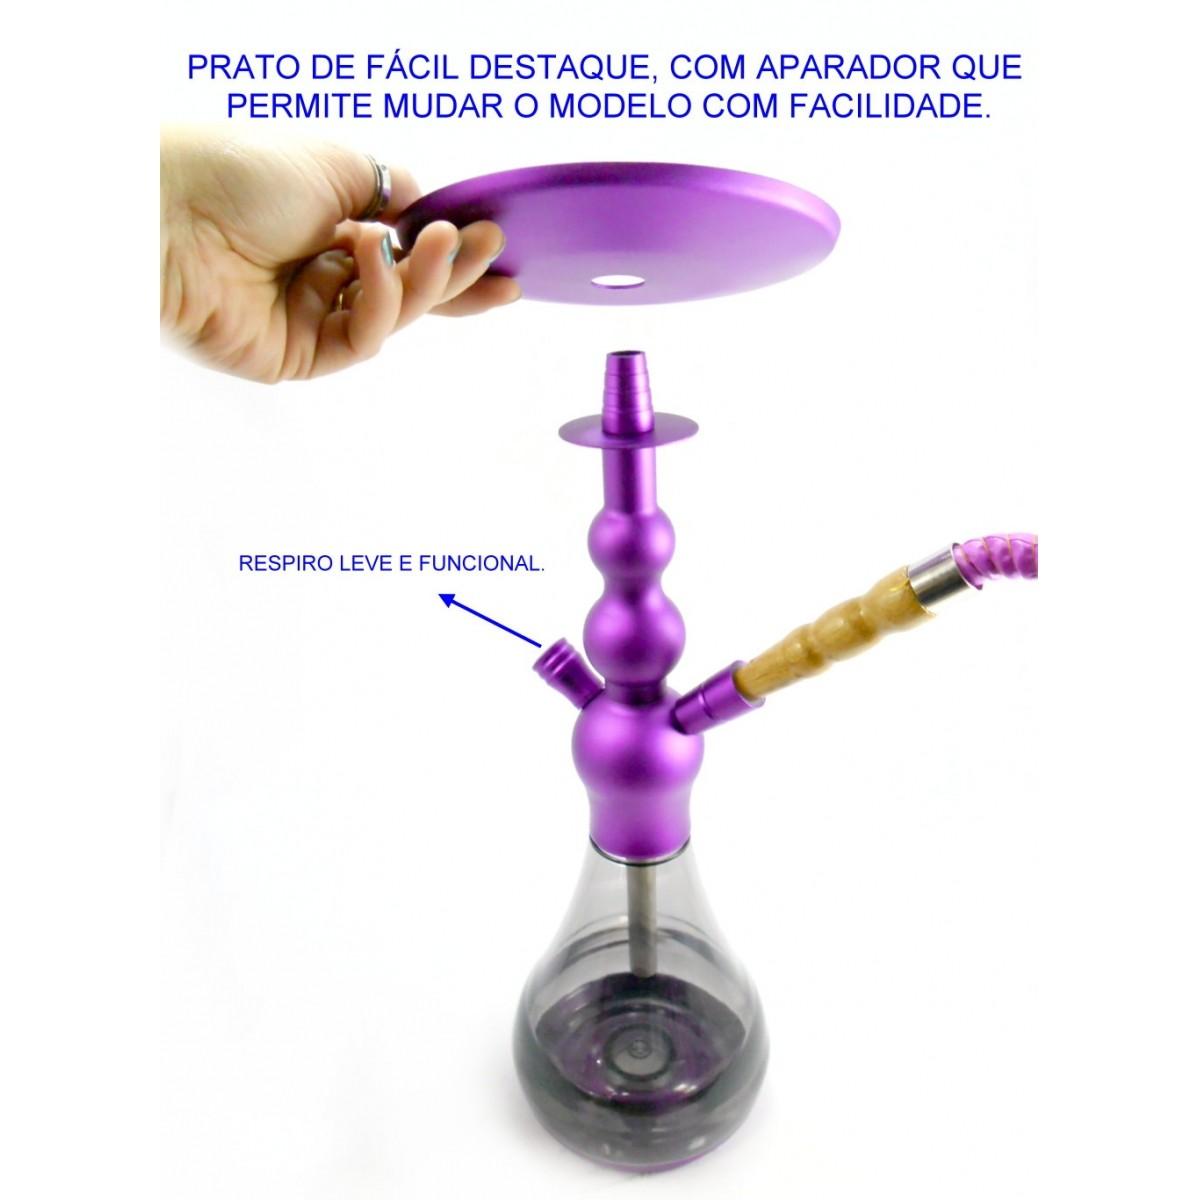 Narguile YAHYA 42 cm, em ALUMÍNIO VERMELHO, inoxidável. Vaso ACRÍLICO fumê. 1 mangueira. mod. MV42_ALUMCOLOR_Y13_1S-VERM